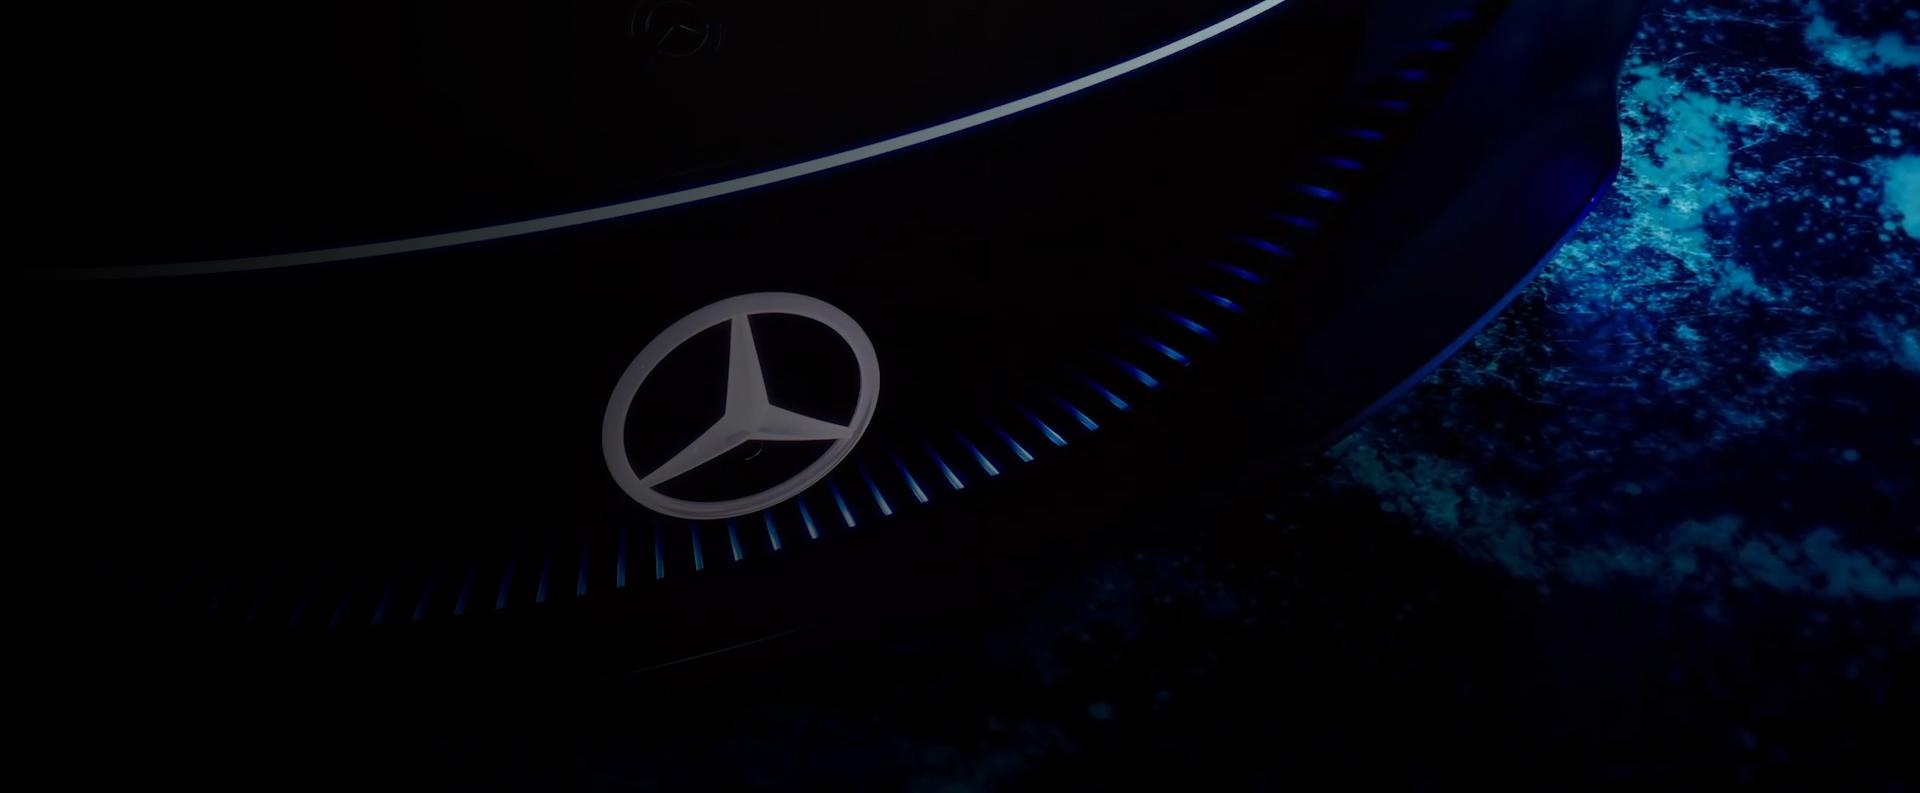 Ecoincentivi auto smart e Mercedes-Benz